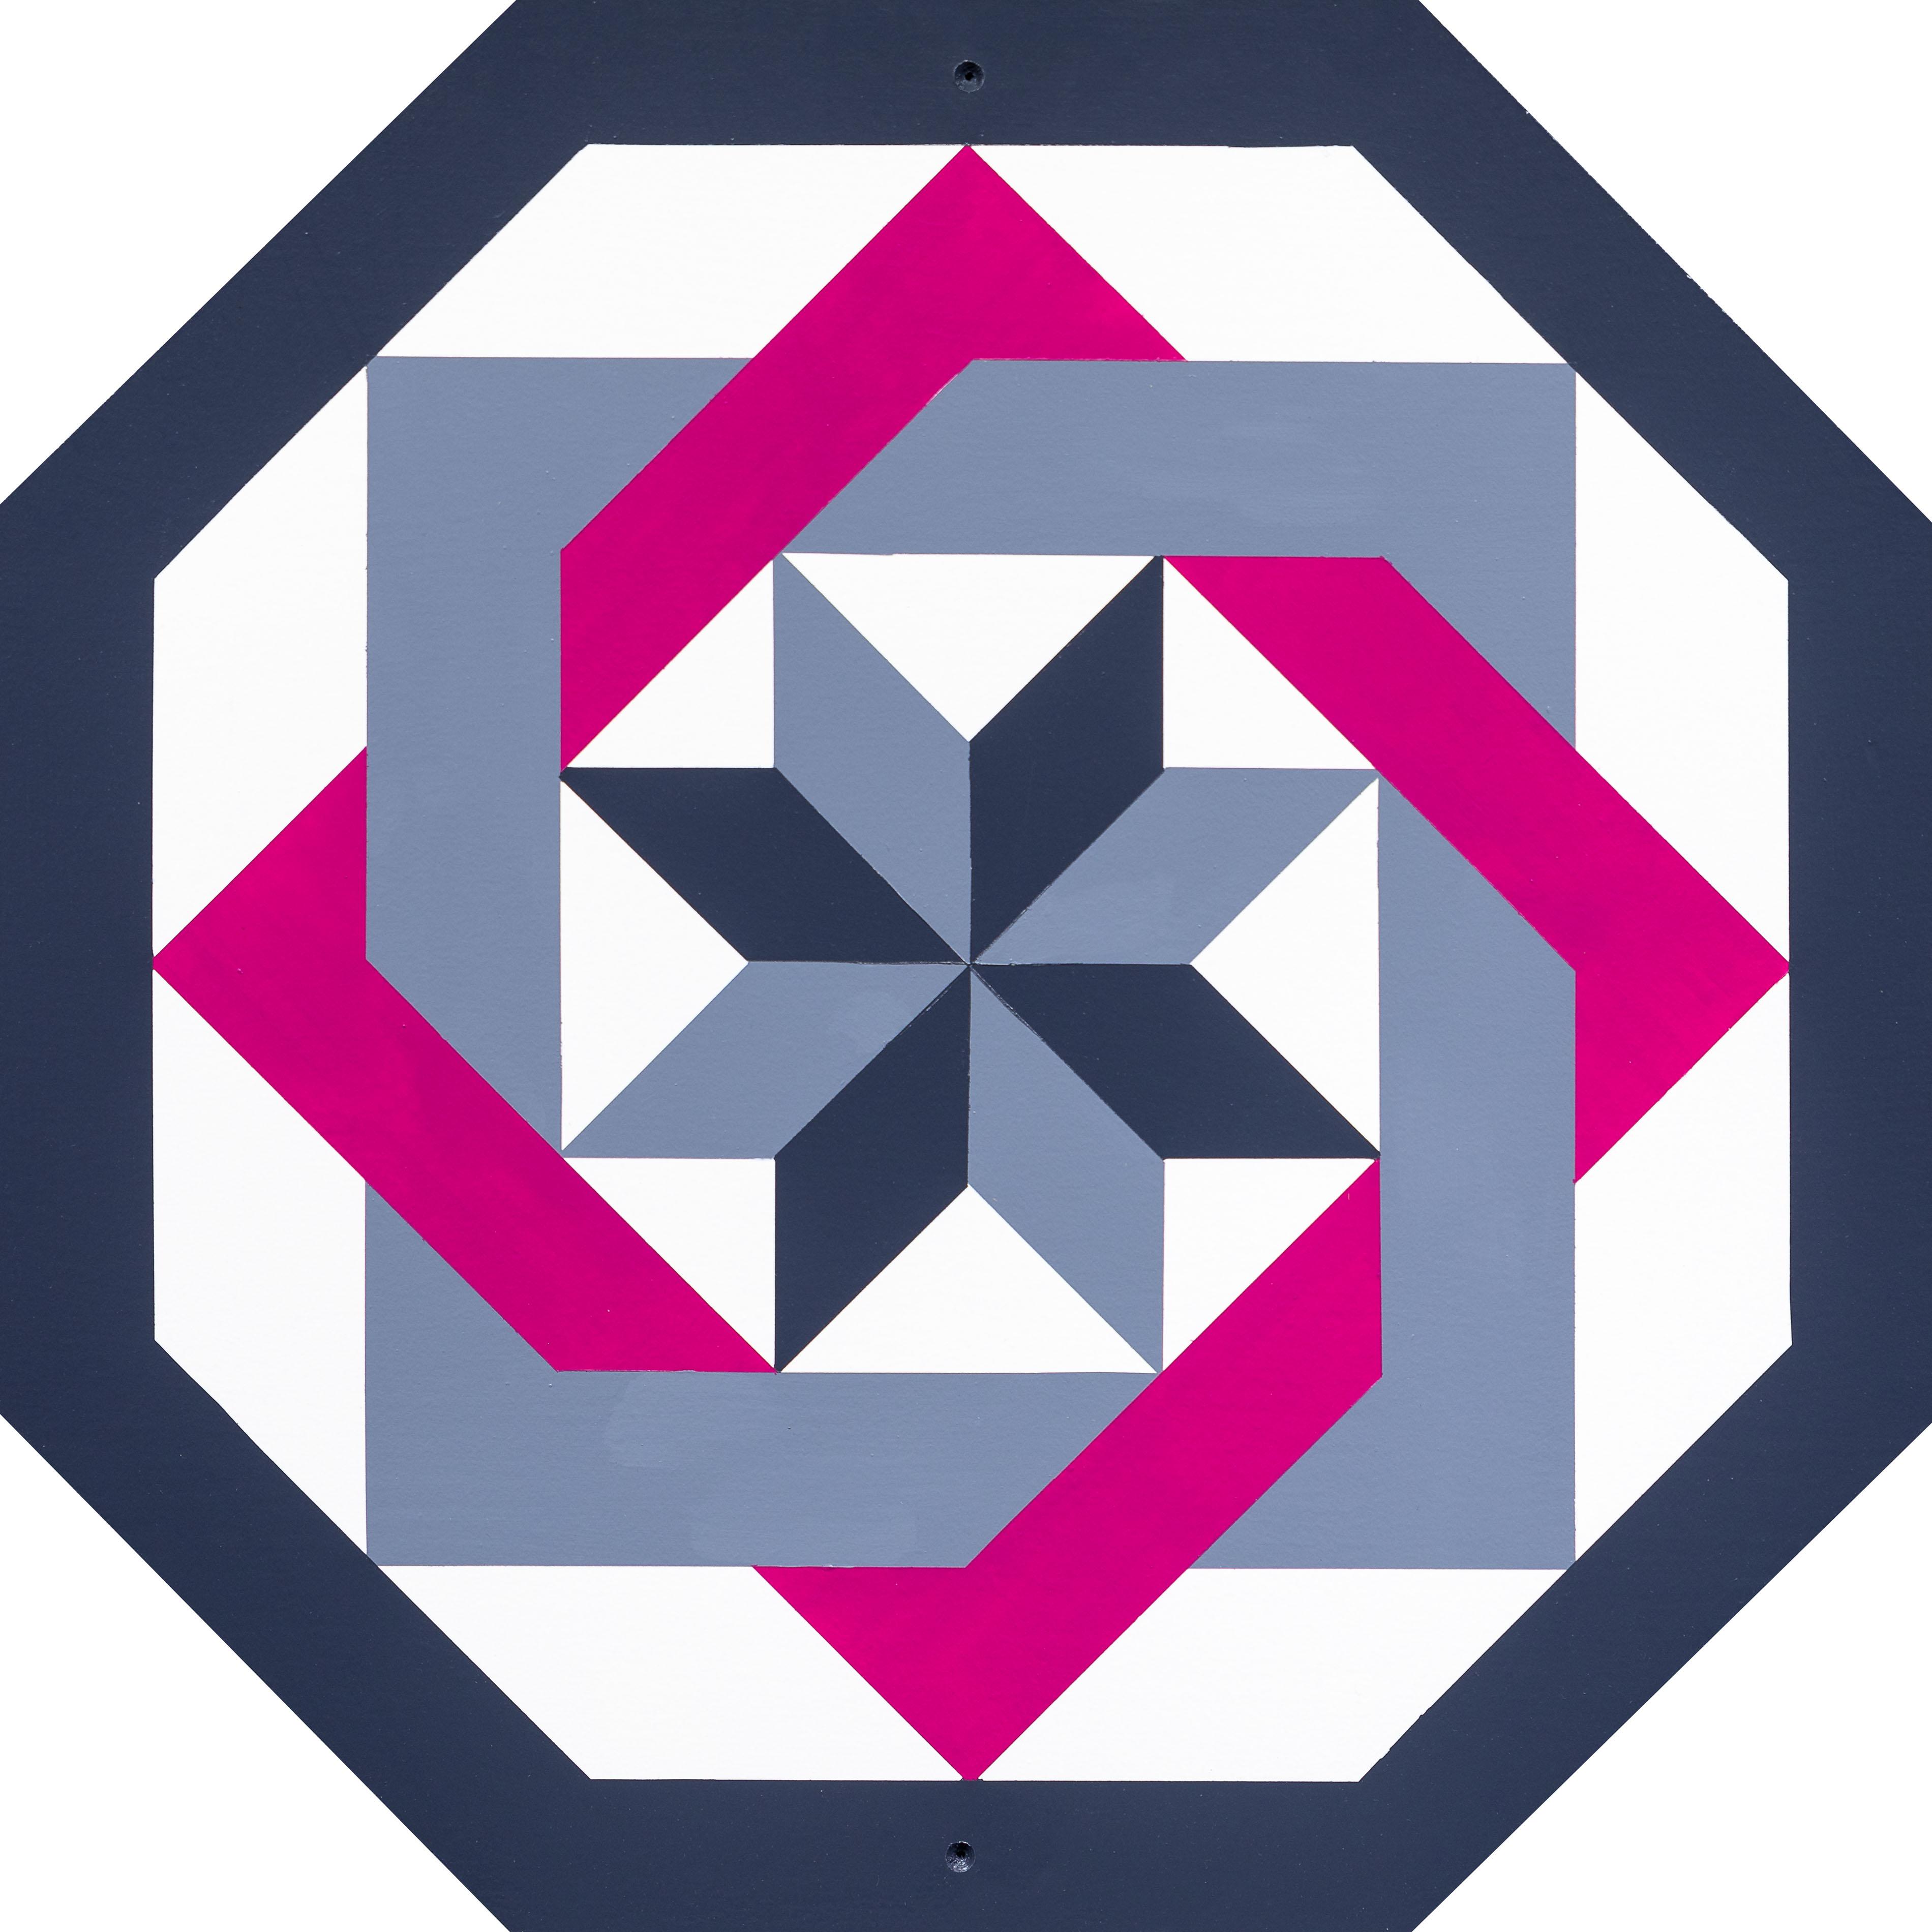 Barn Quilt Labyrinth Pink